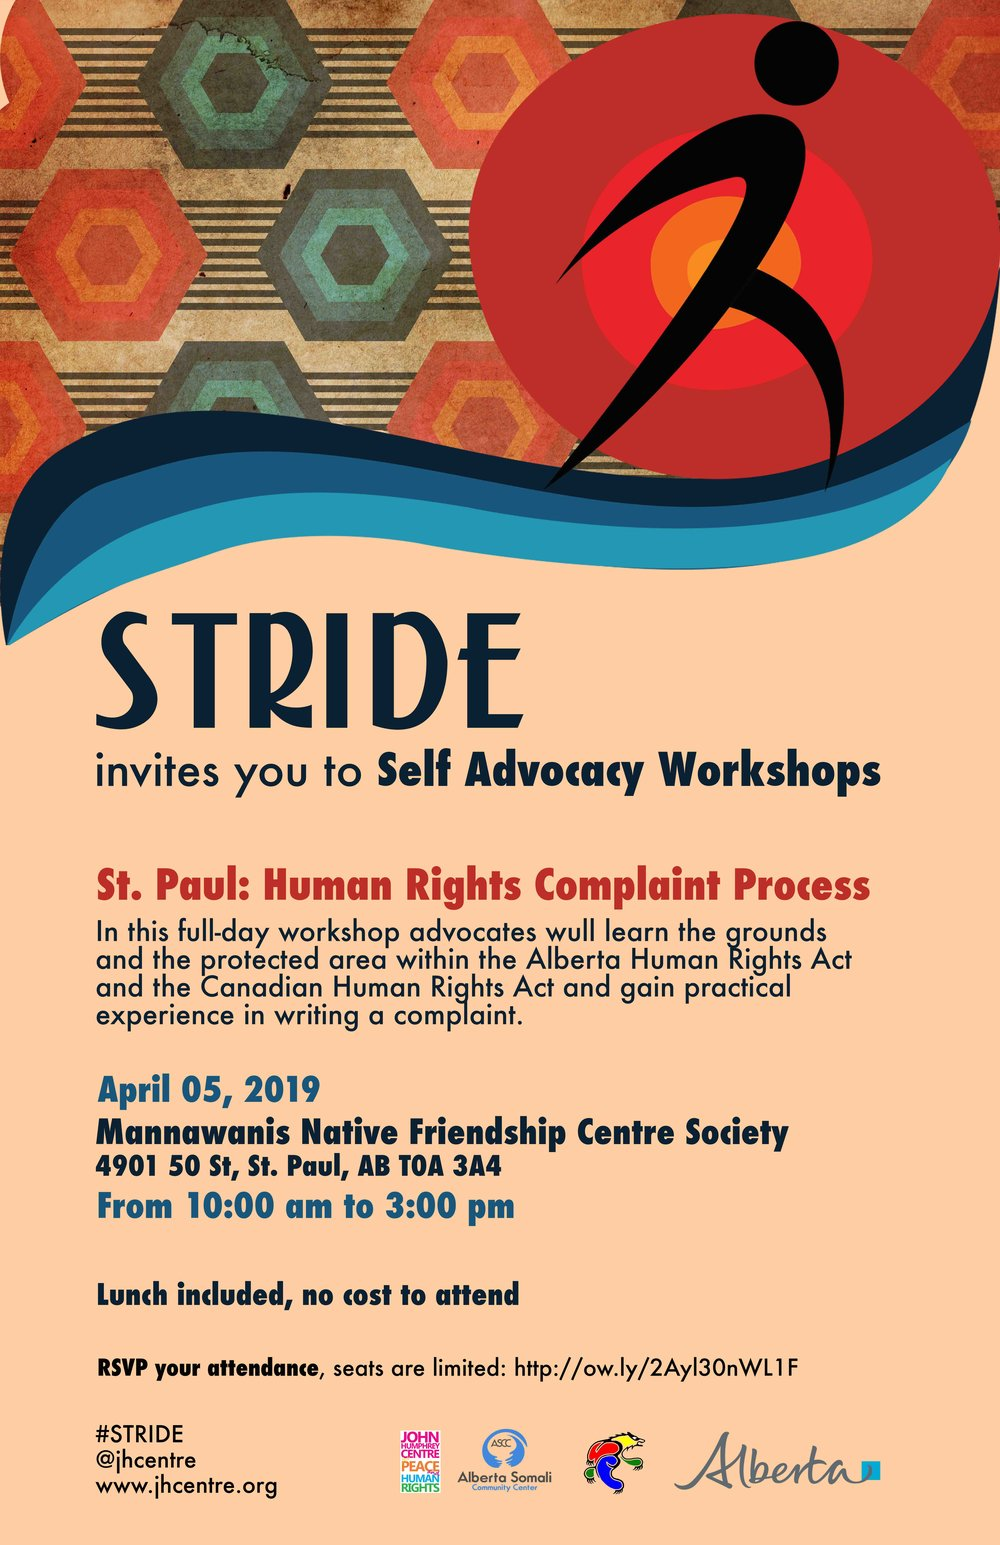 Stride St. Paul: Human Rights Complaint Process